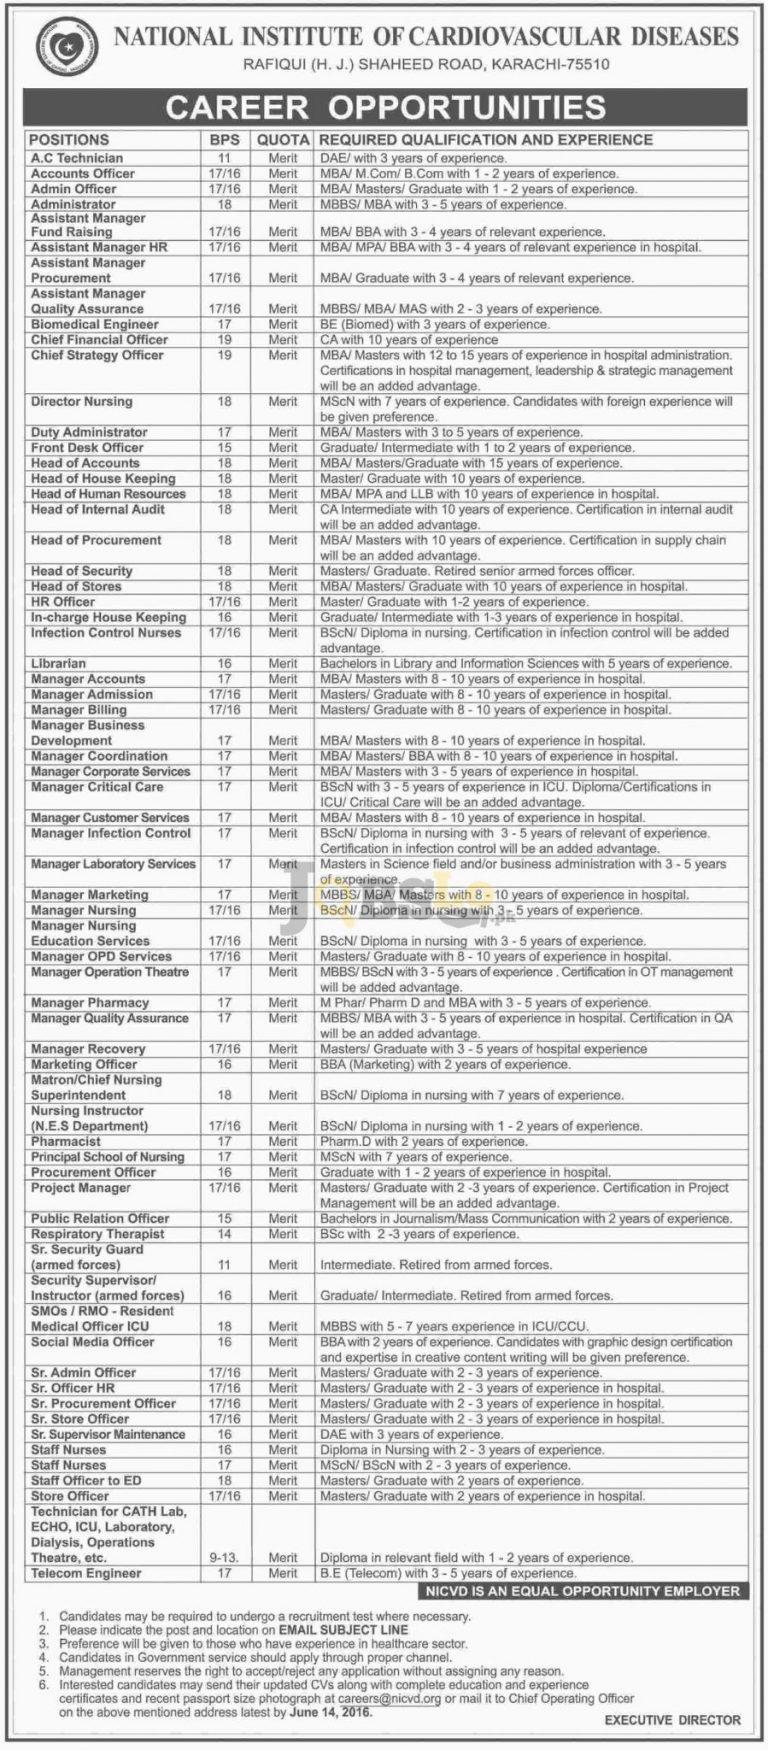 National Institute of Cardiovascular Diseases Jobs 2016 in Karachi Employment Opportunities